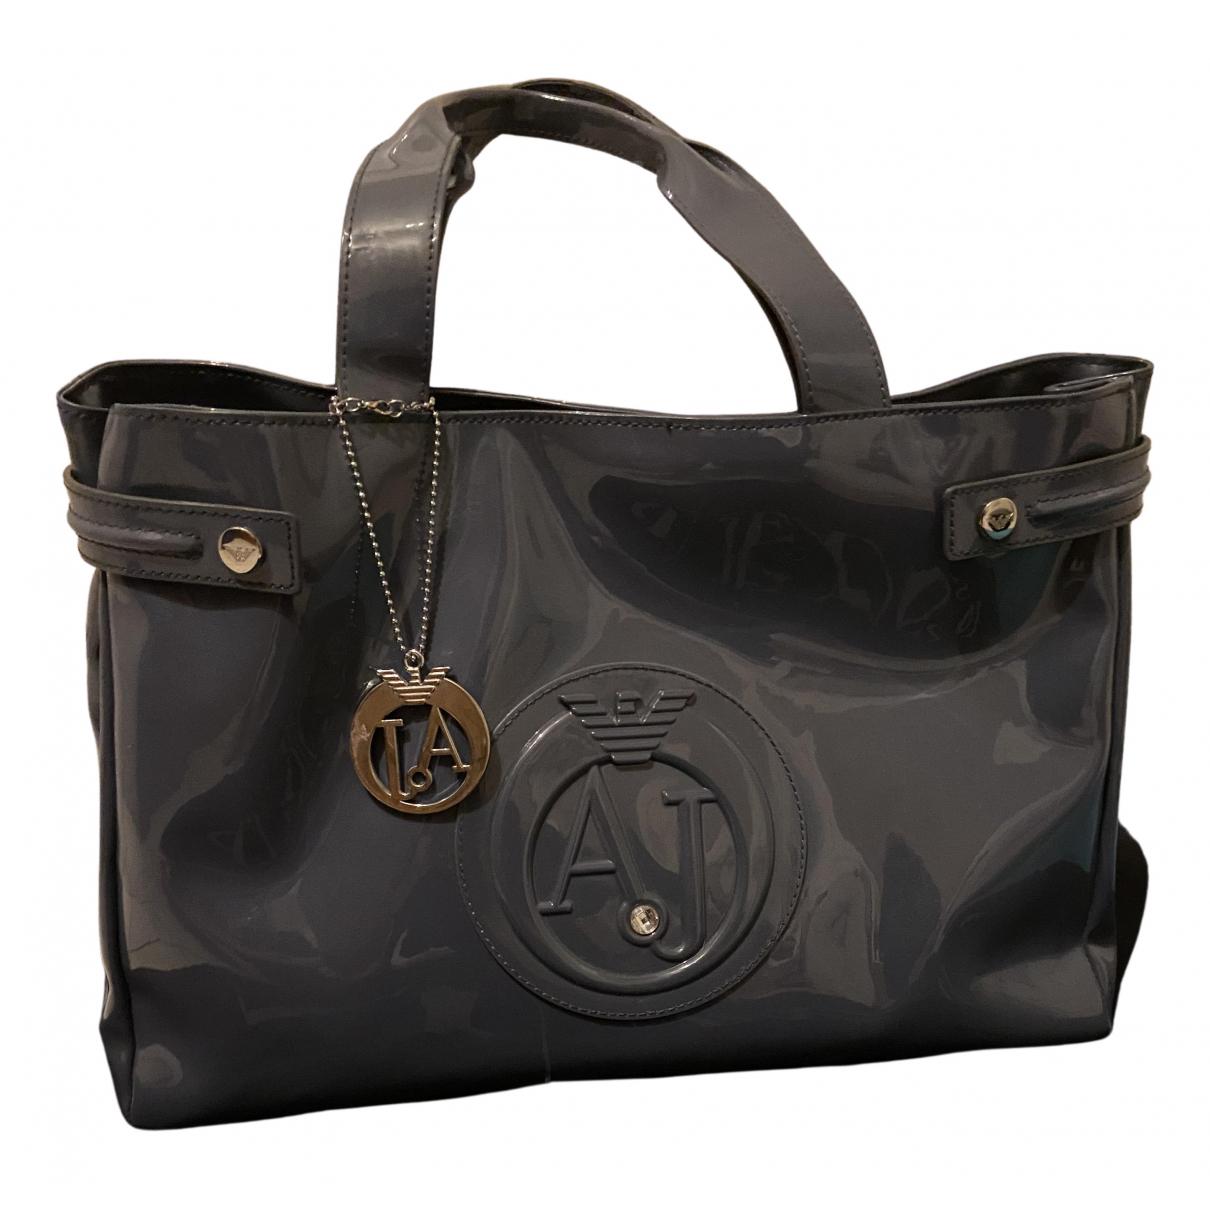 Armani Jeans N Blue handbag for Women N